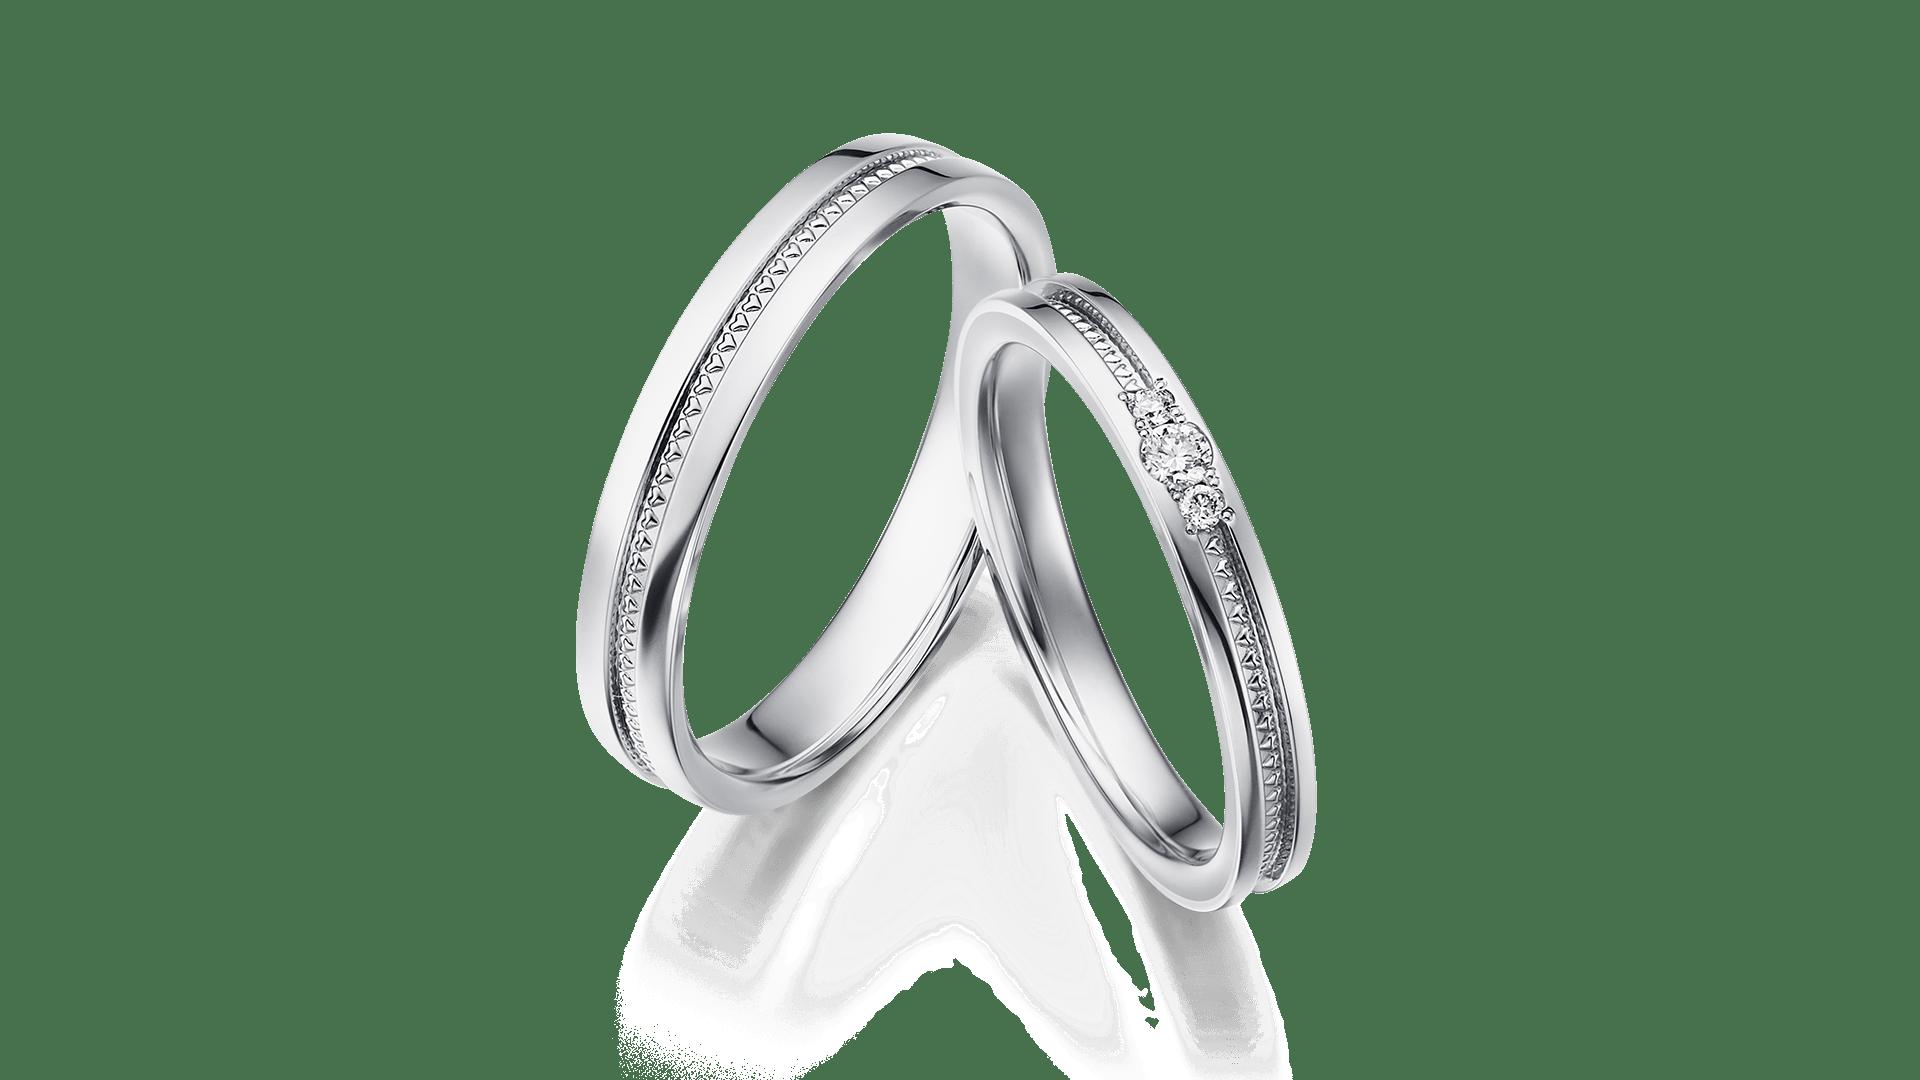 dione ディオーネ | 結婚指輪サムネイル 2